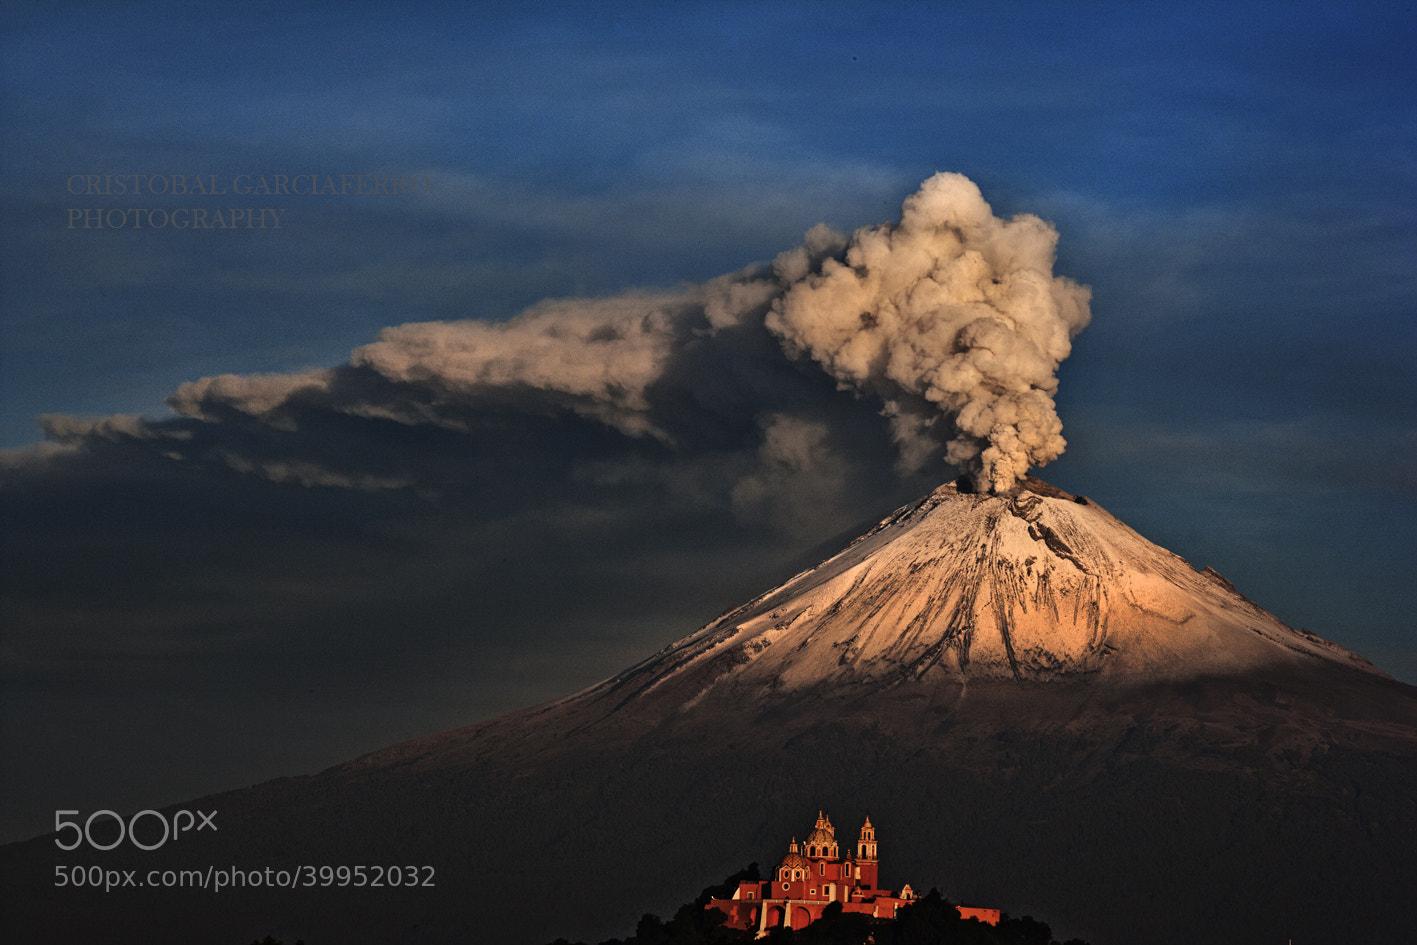 Photograph Popocatepetl this morning by Cristobal Garciaferro Rubio on 500px